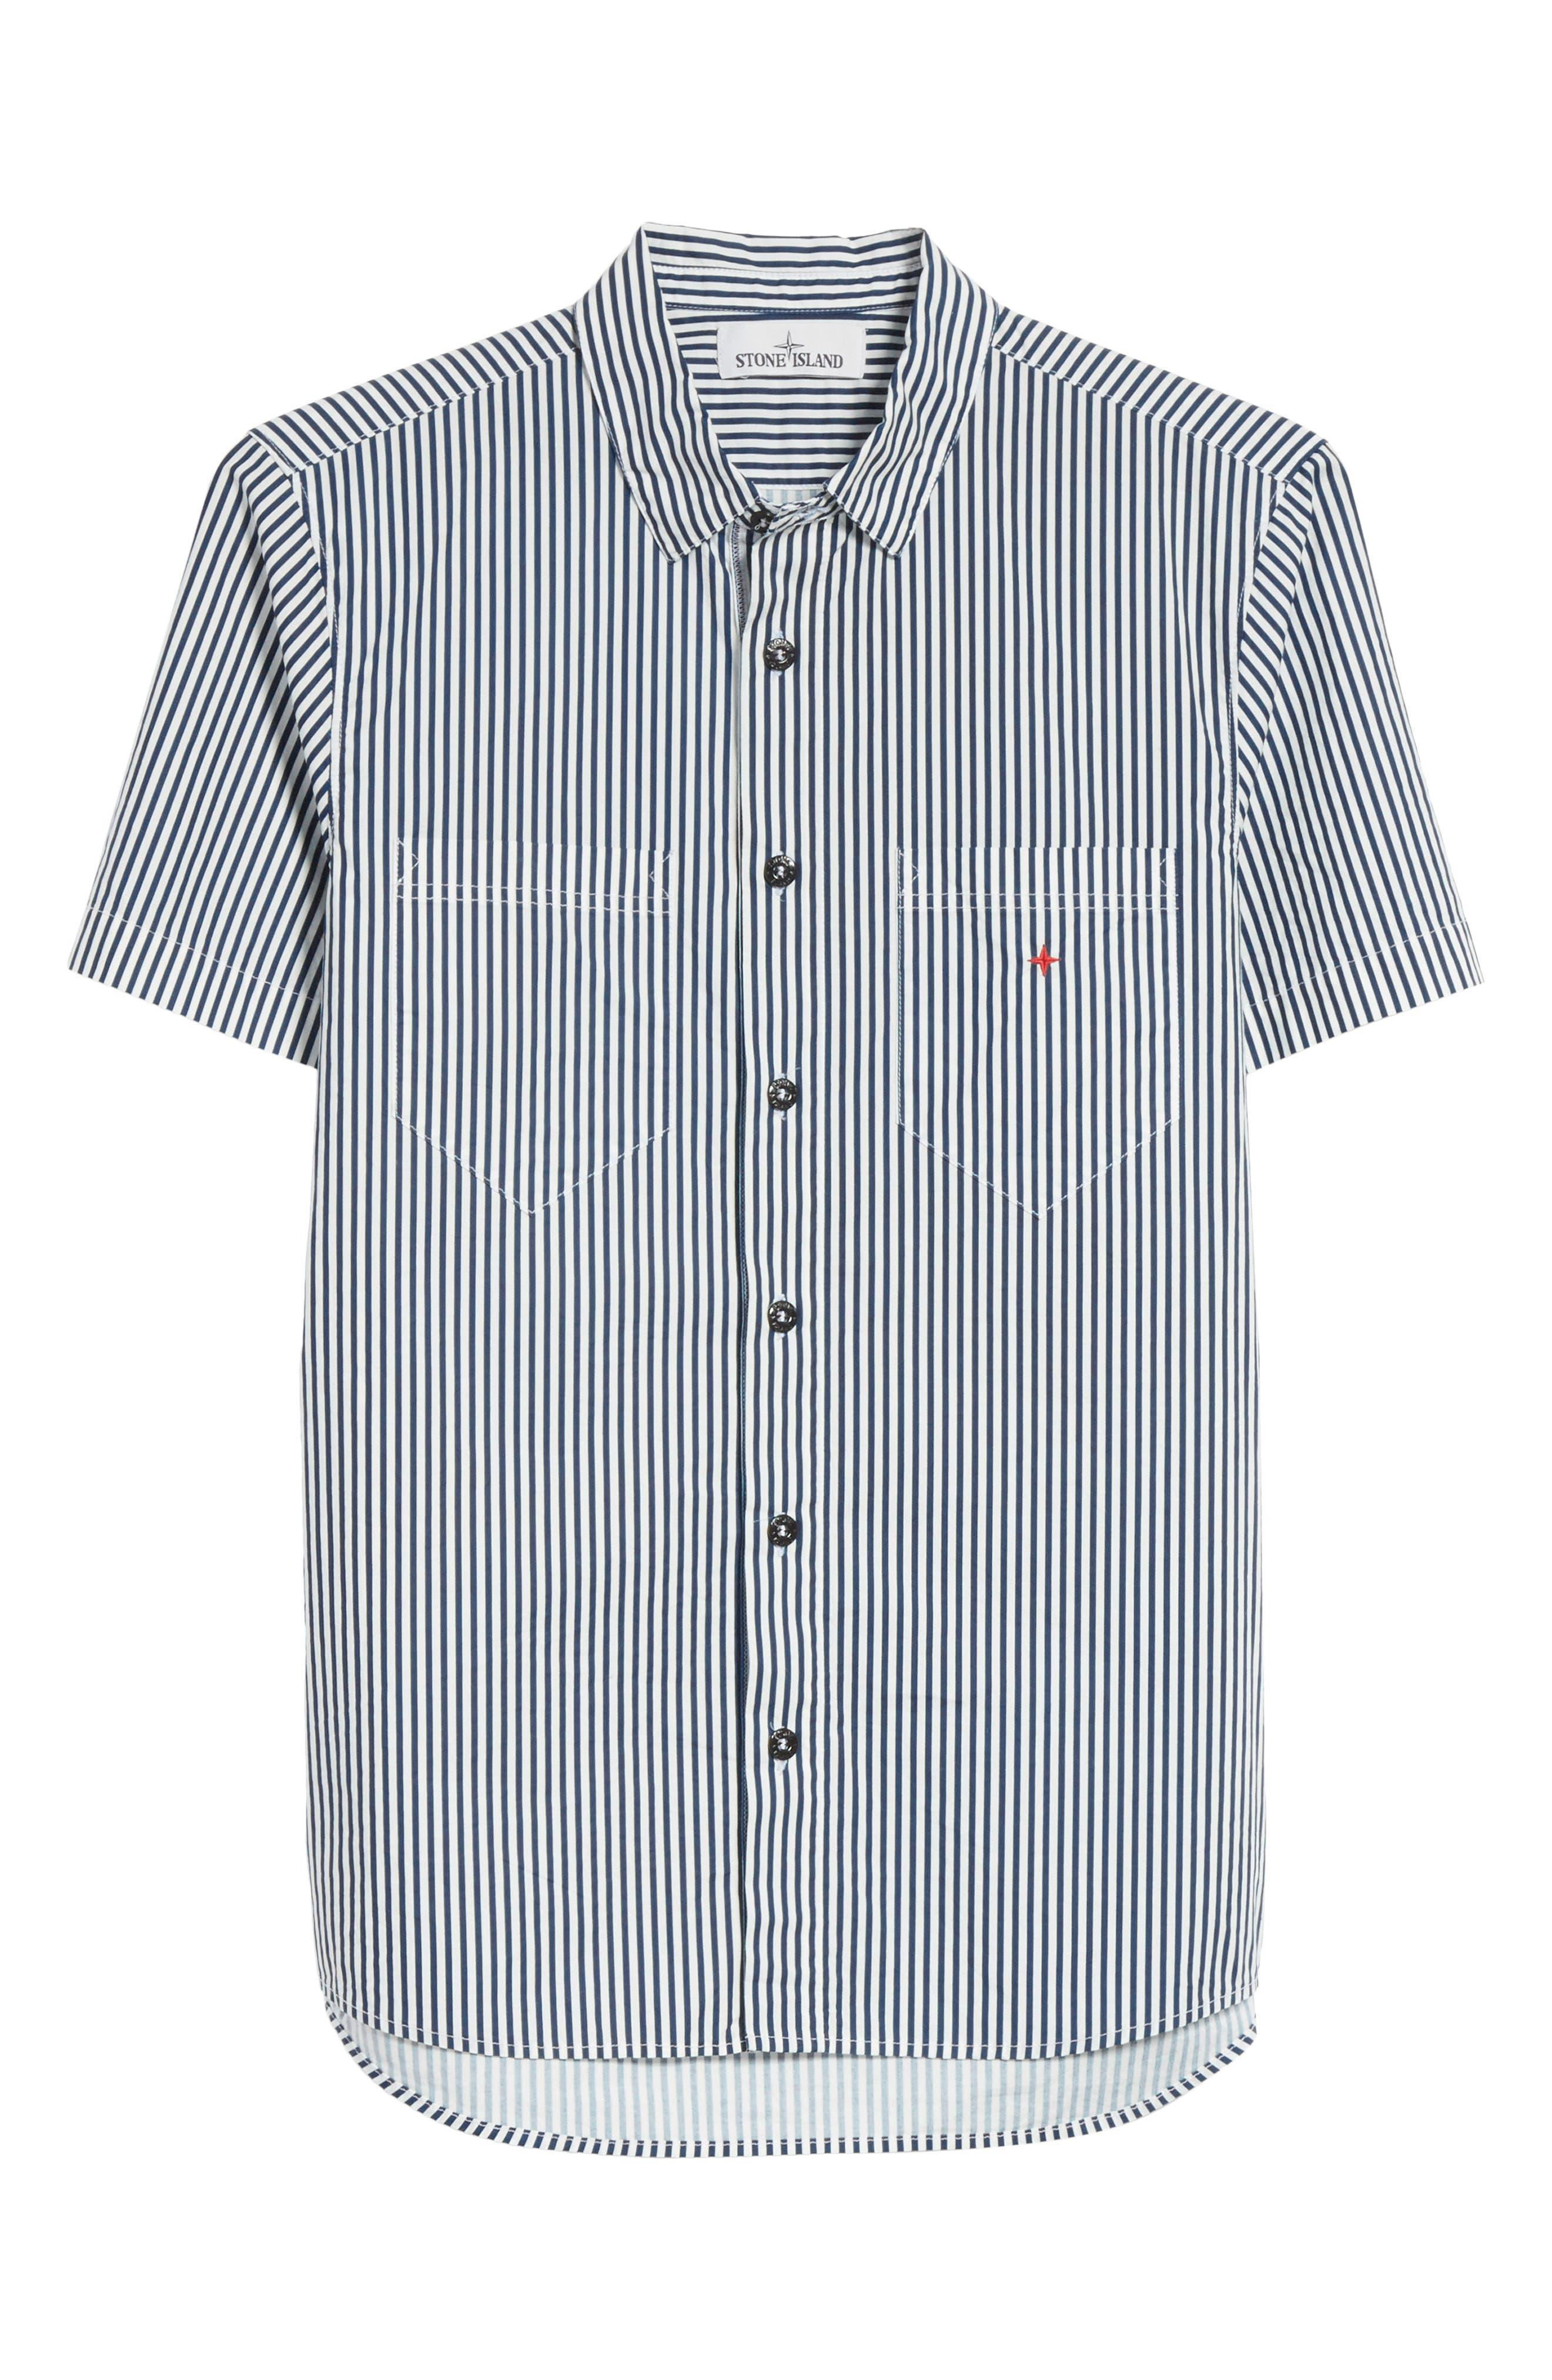 STONE ISLAND,                             Stripe Woven Shirt,                             Alternate thumbnail 6, color,                             100